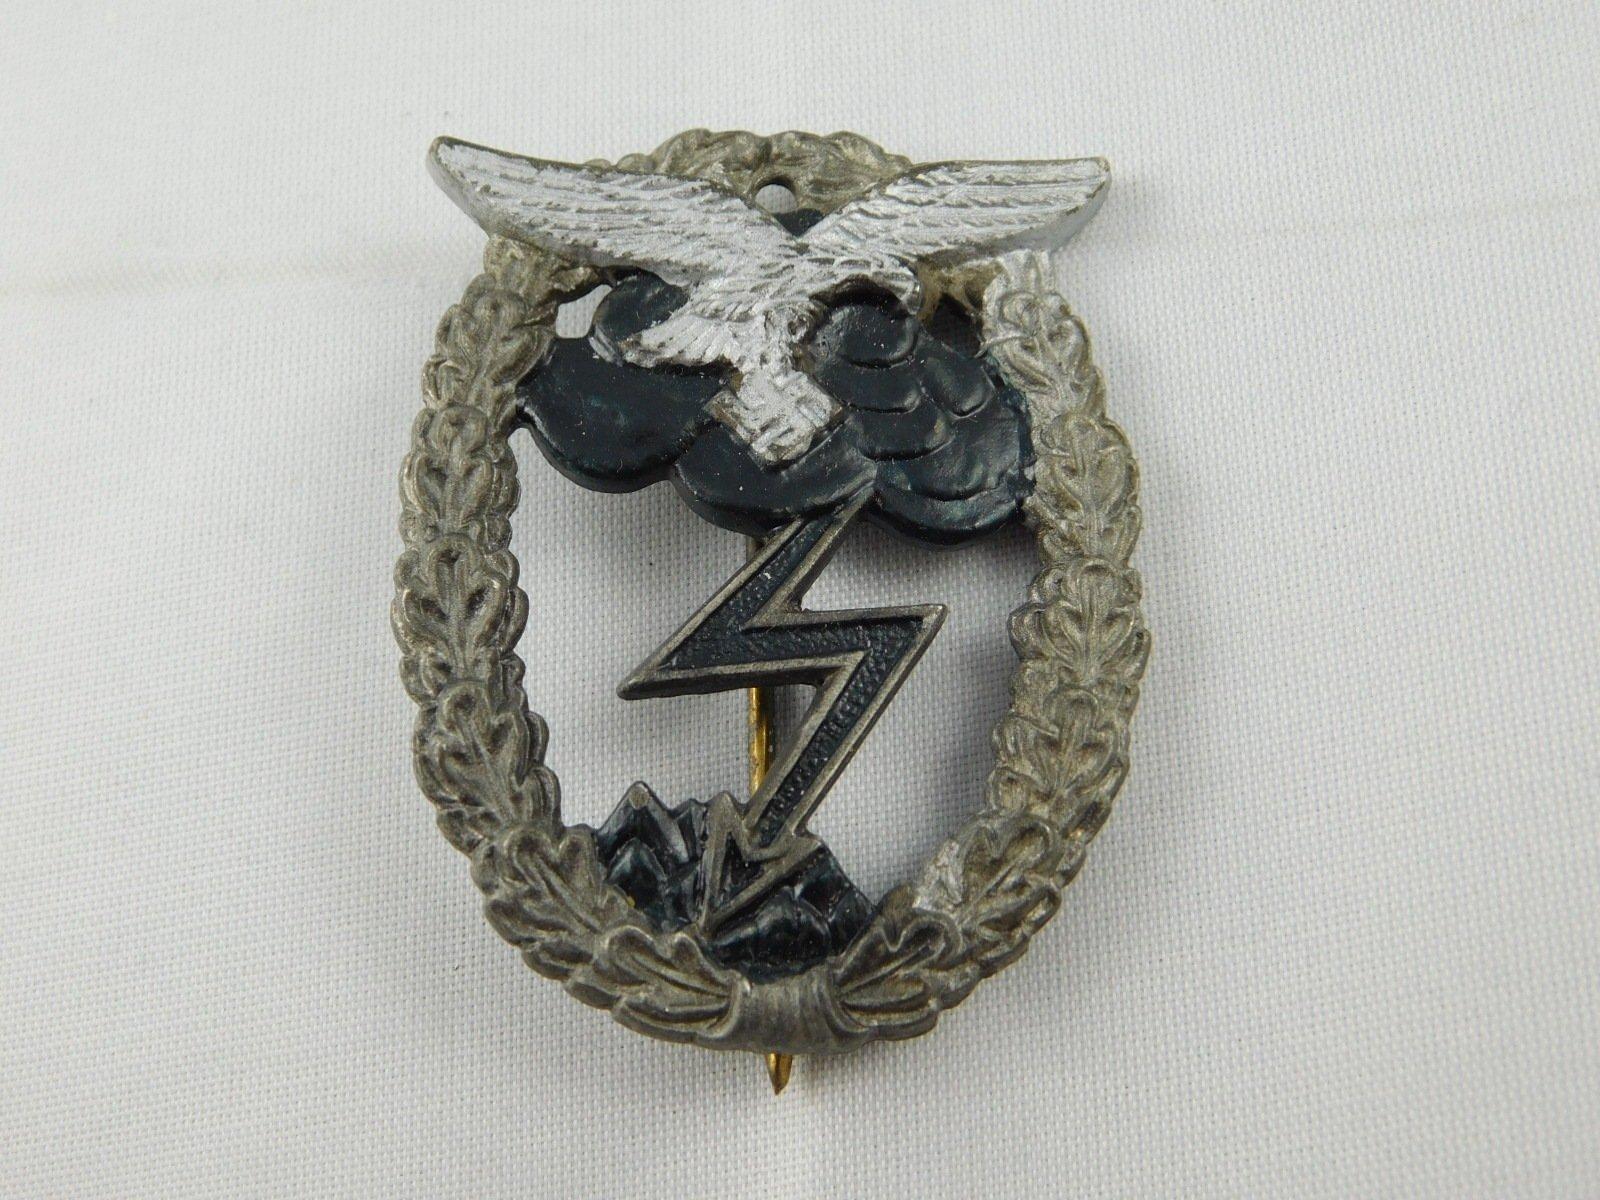 WWII German Luftwaffe Ground Combat Badge 1942-45 - Trade In